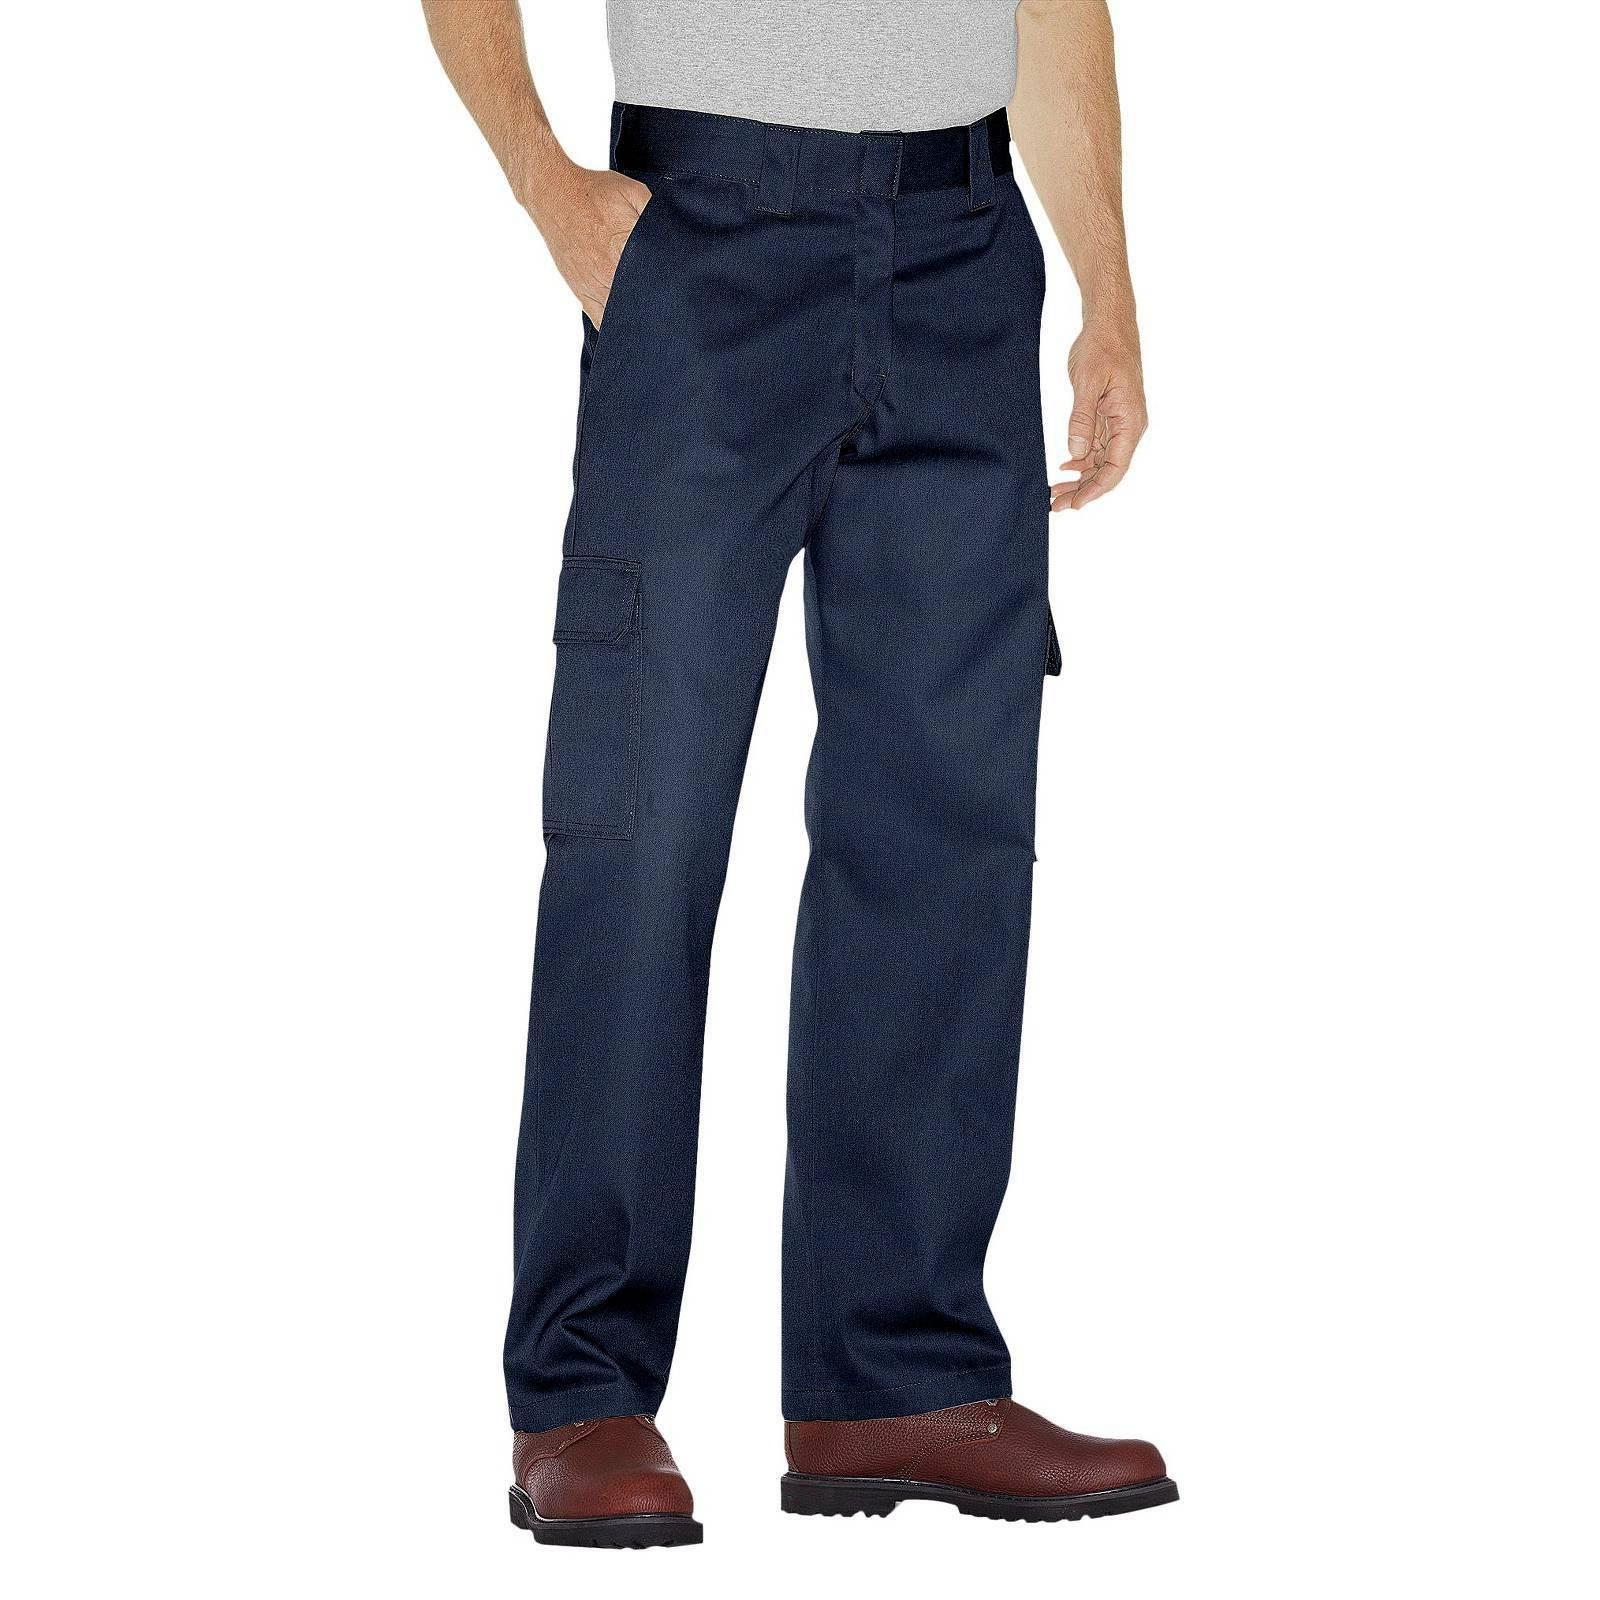 Dickies WP592 Fit Cargo Uniform Straight Leg Workwear